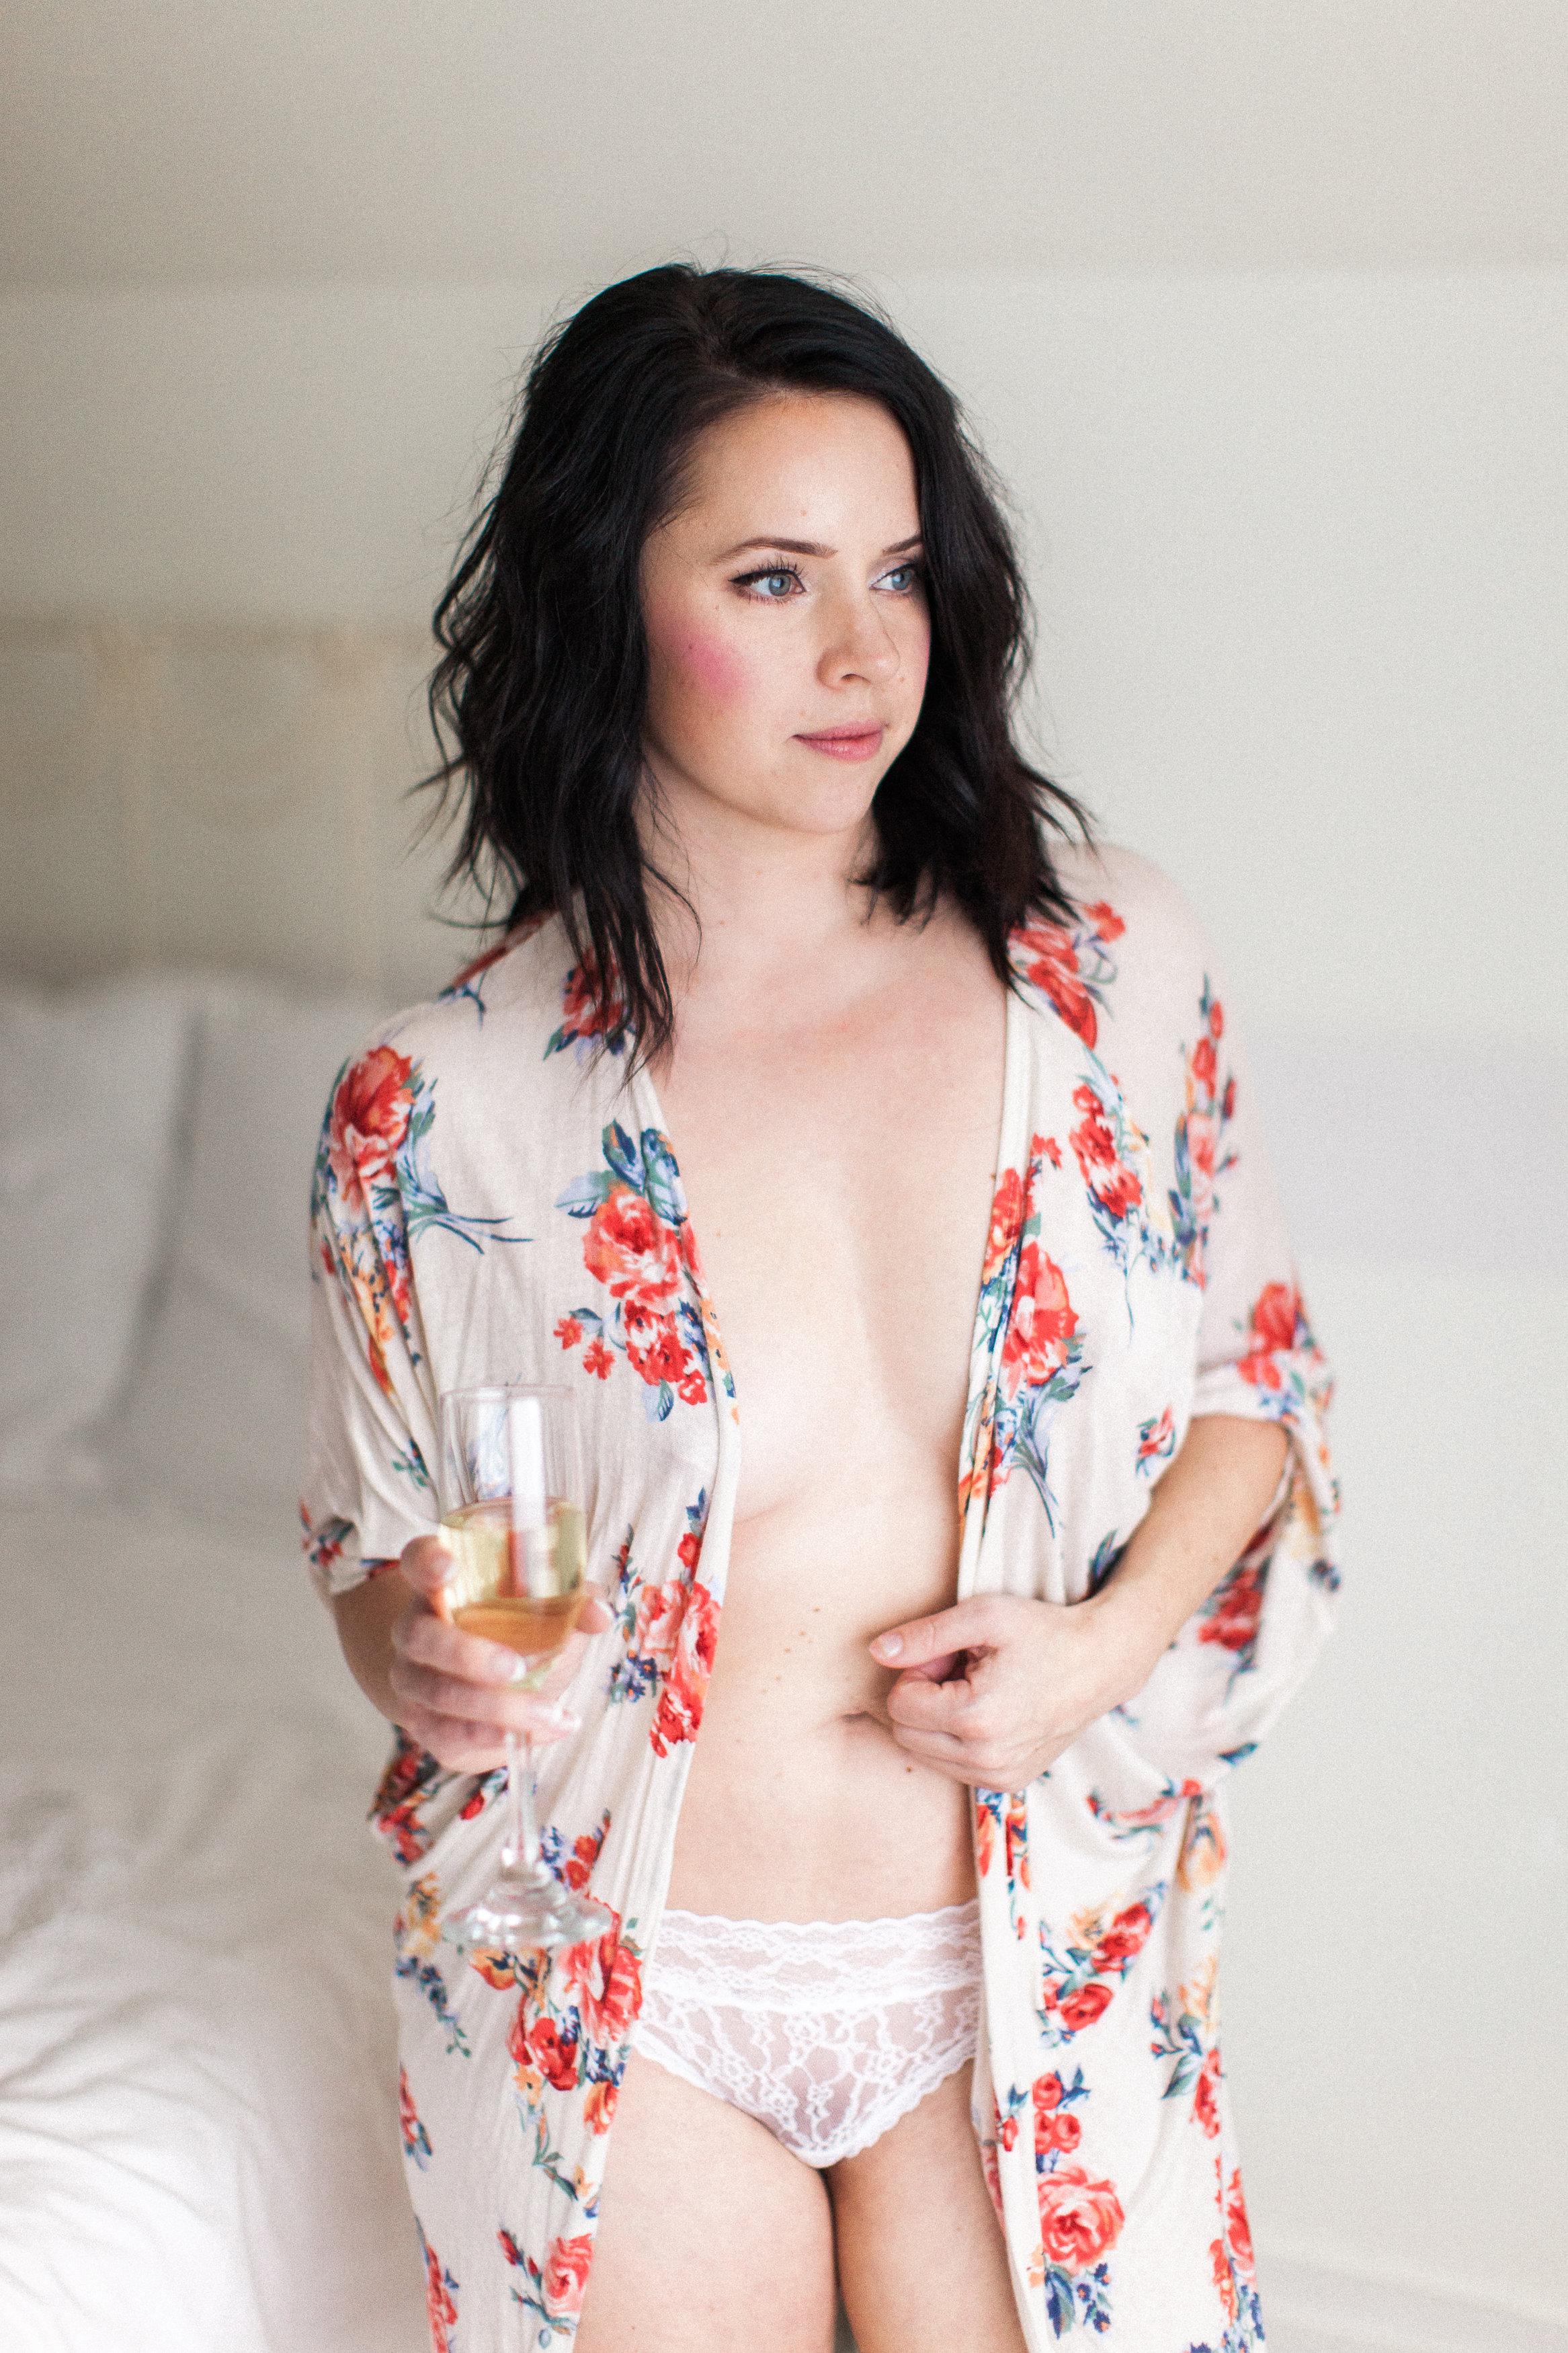 boudoir photographer tacoma seattle